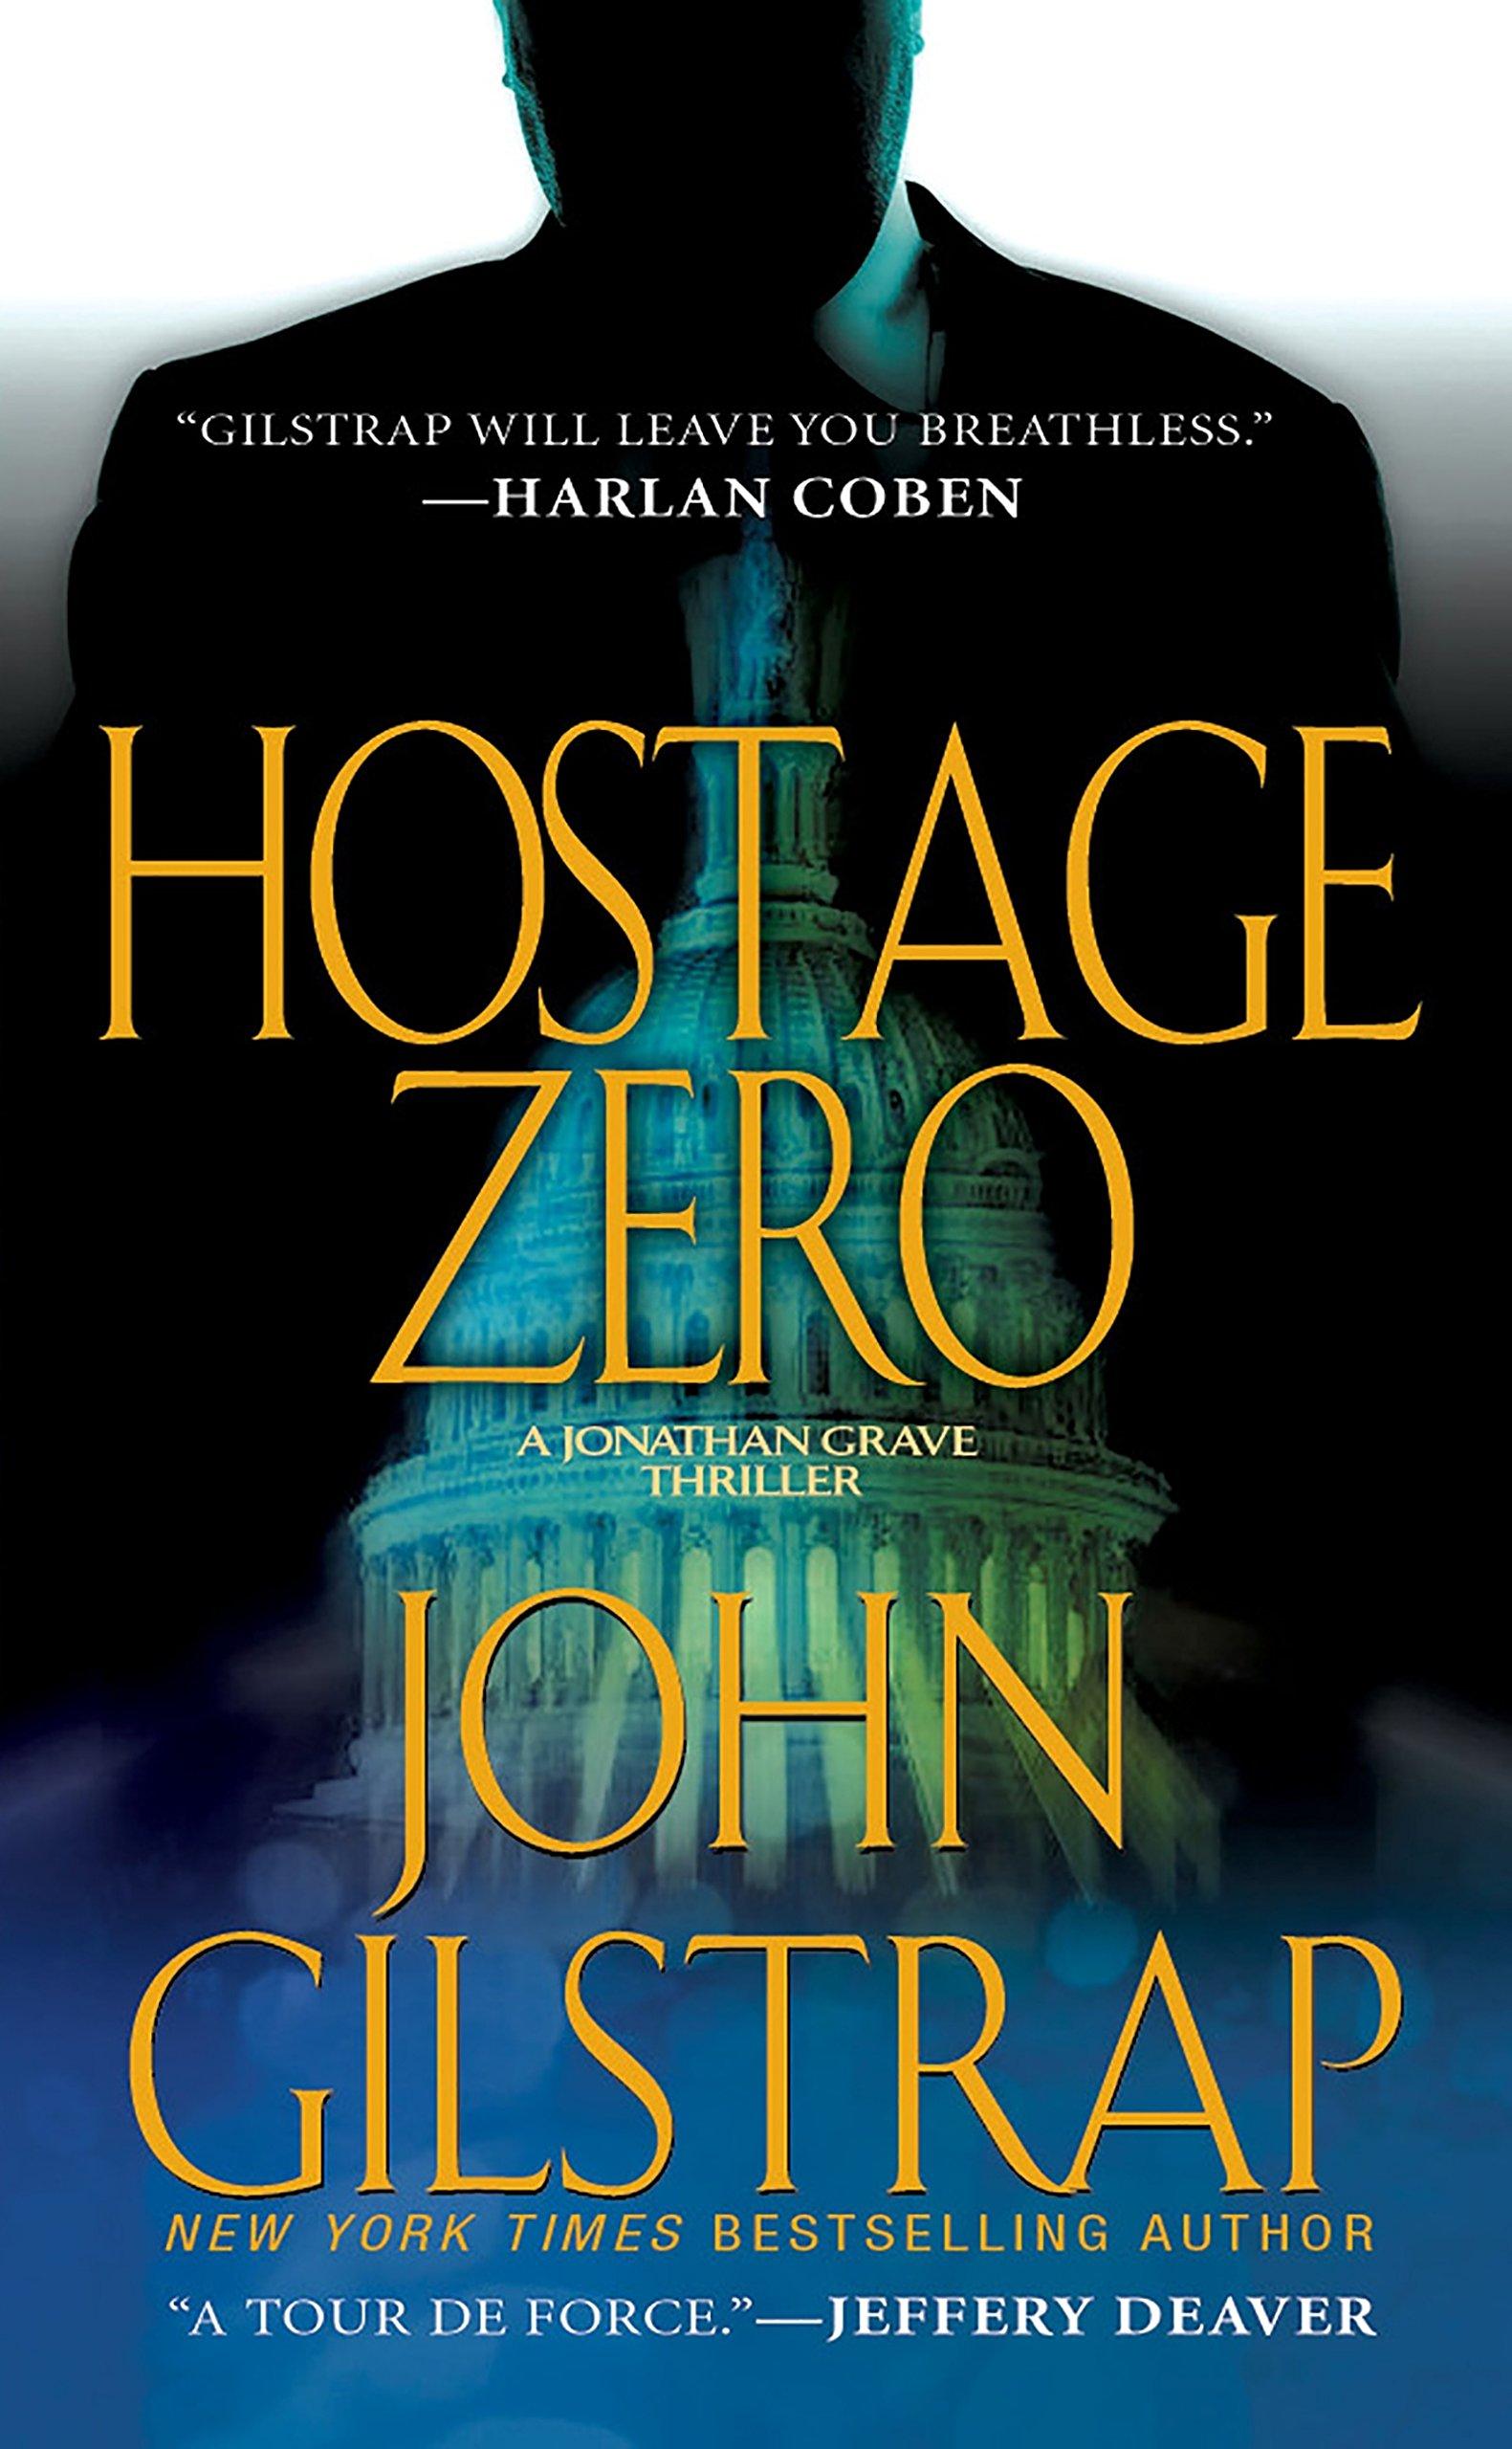 Amazon.com: Hostage Zero (A Jonathan Grave Thriller) (9780786032259): John  Gilstrap: Books